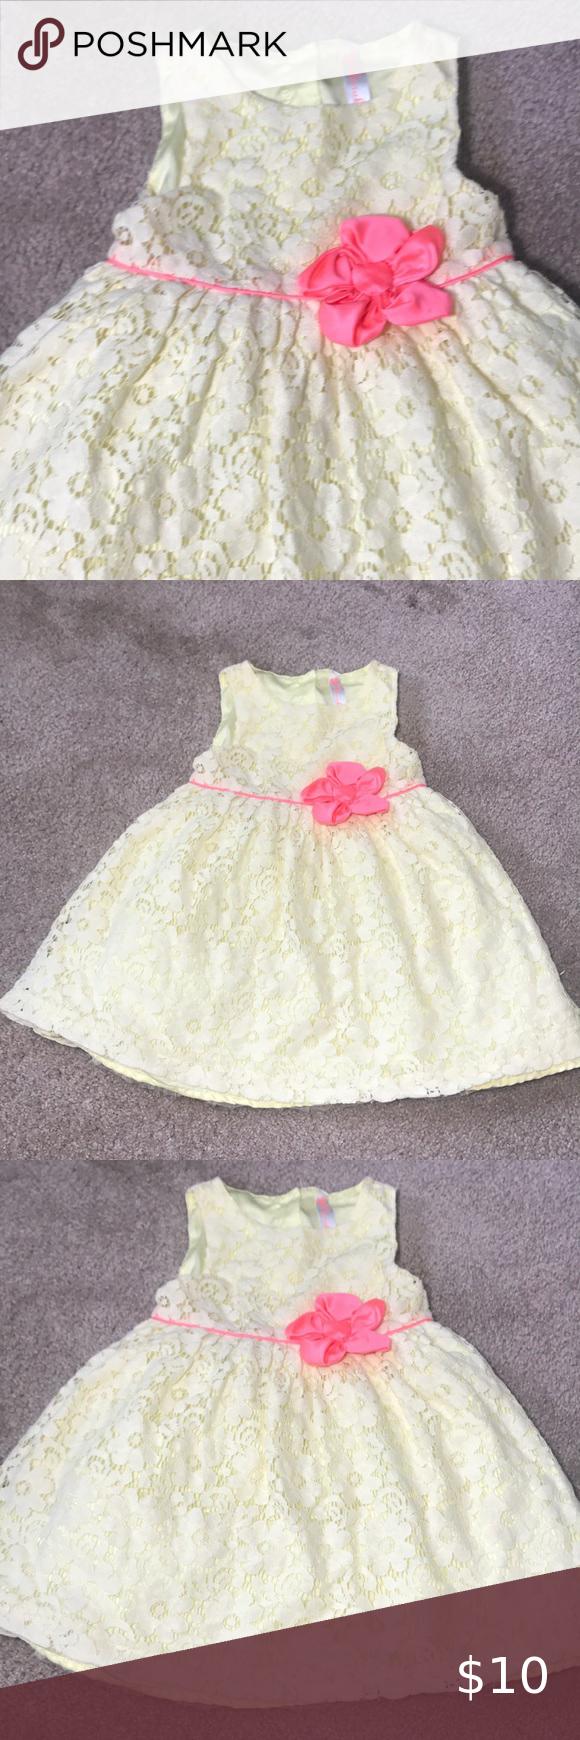 Cherokee Toddler Girl S Spring Summer Dress 4t Summer Dresses Spring Summer Dress Baby Girl Dress [ 1740 x 580 Pixel ]